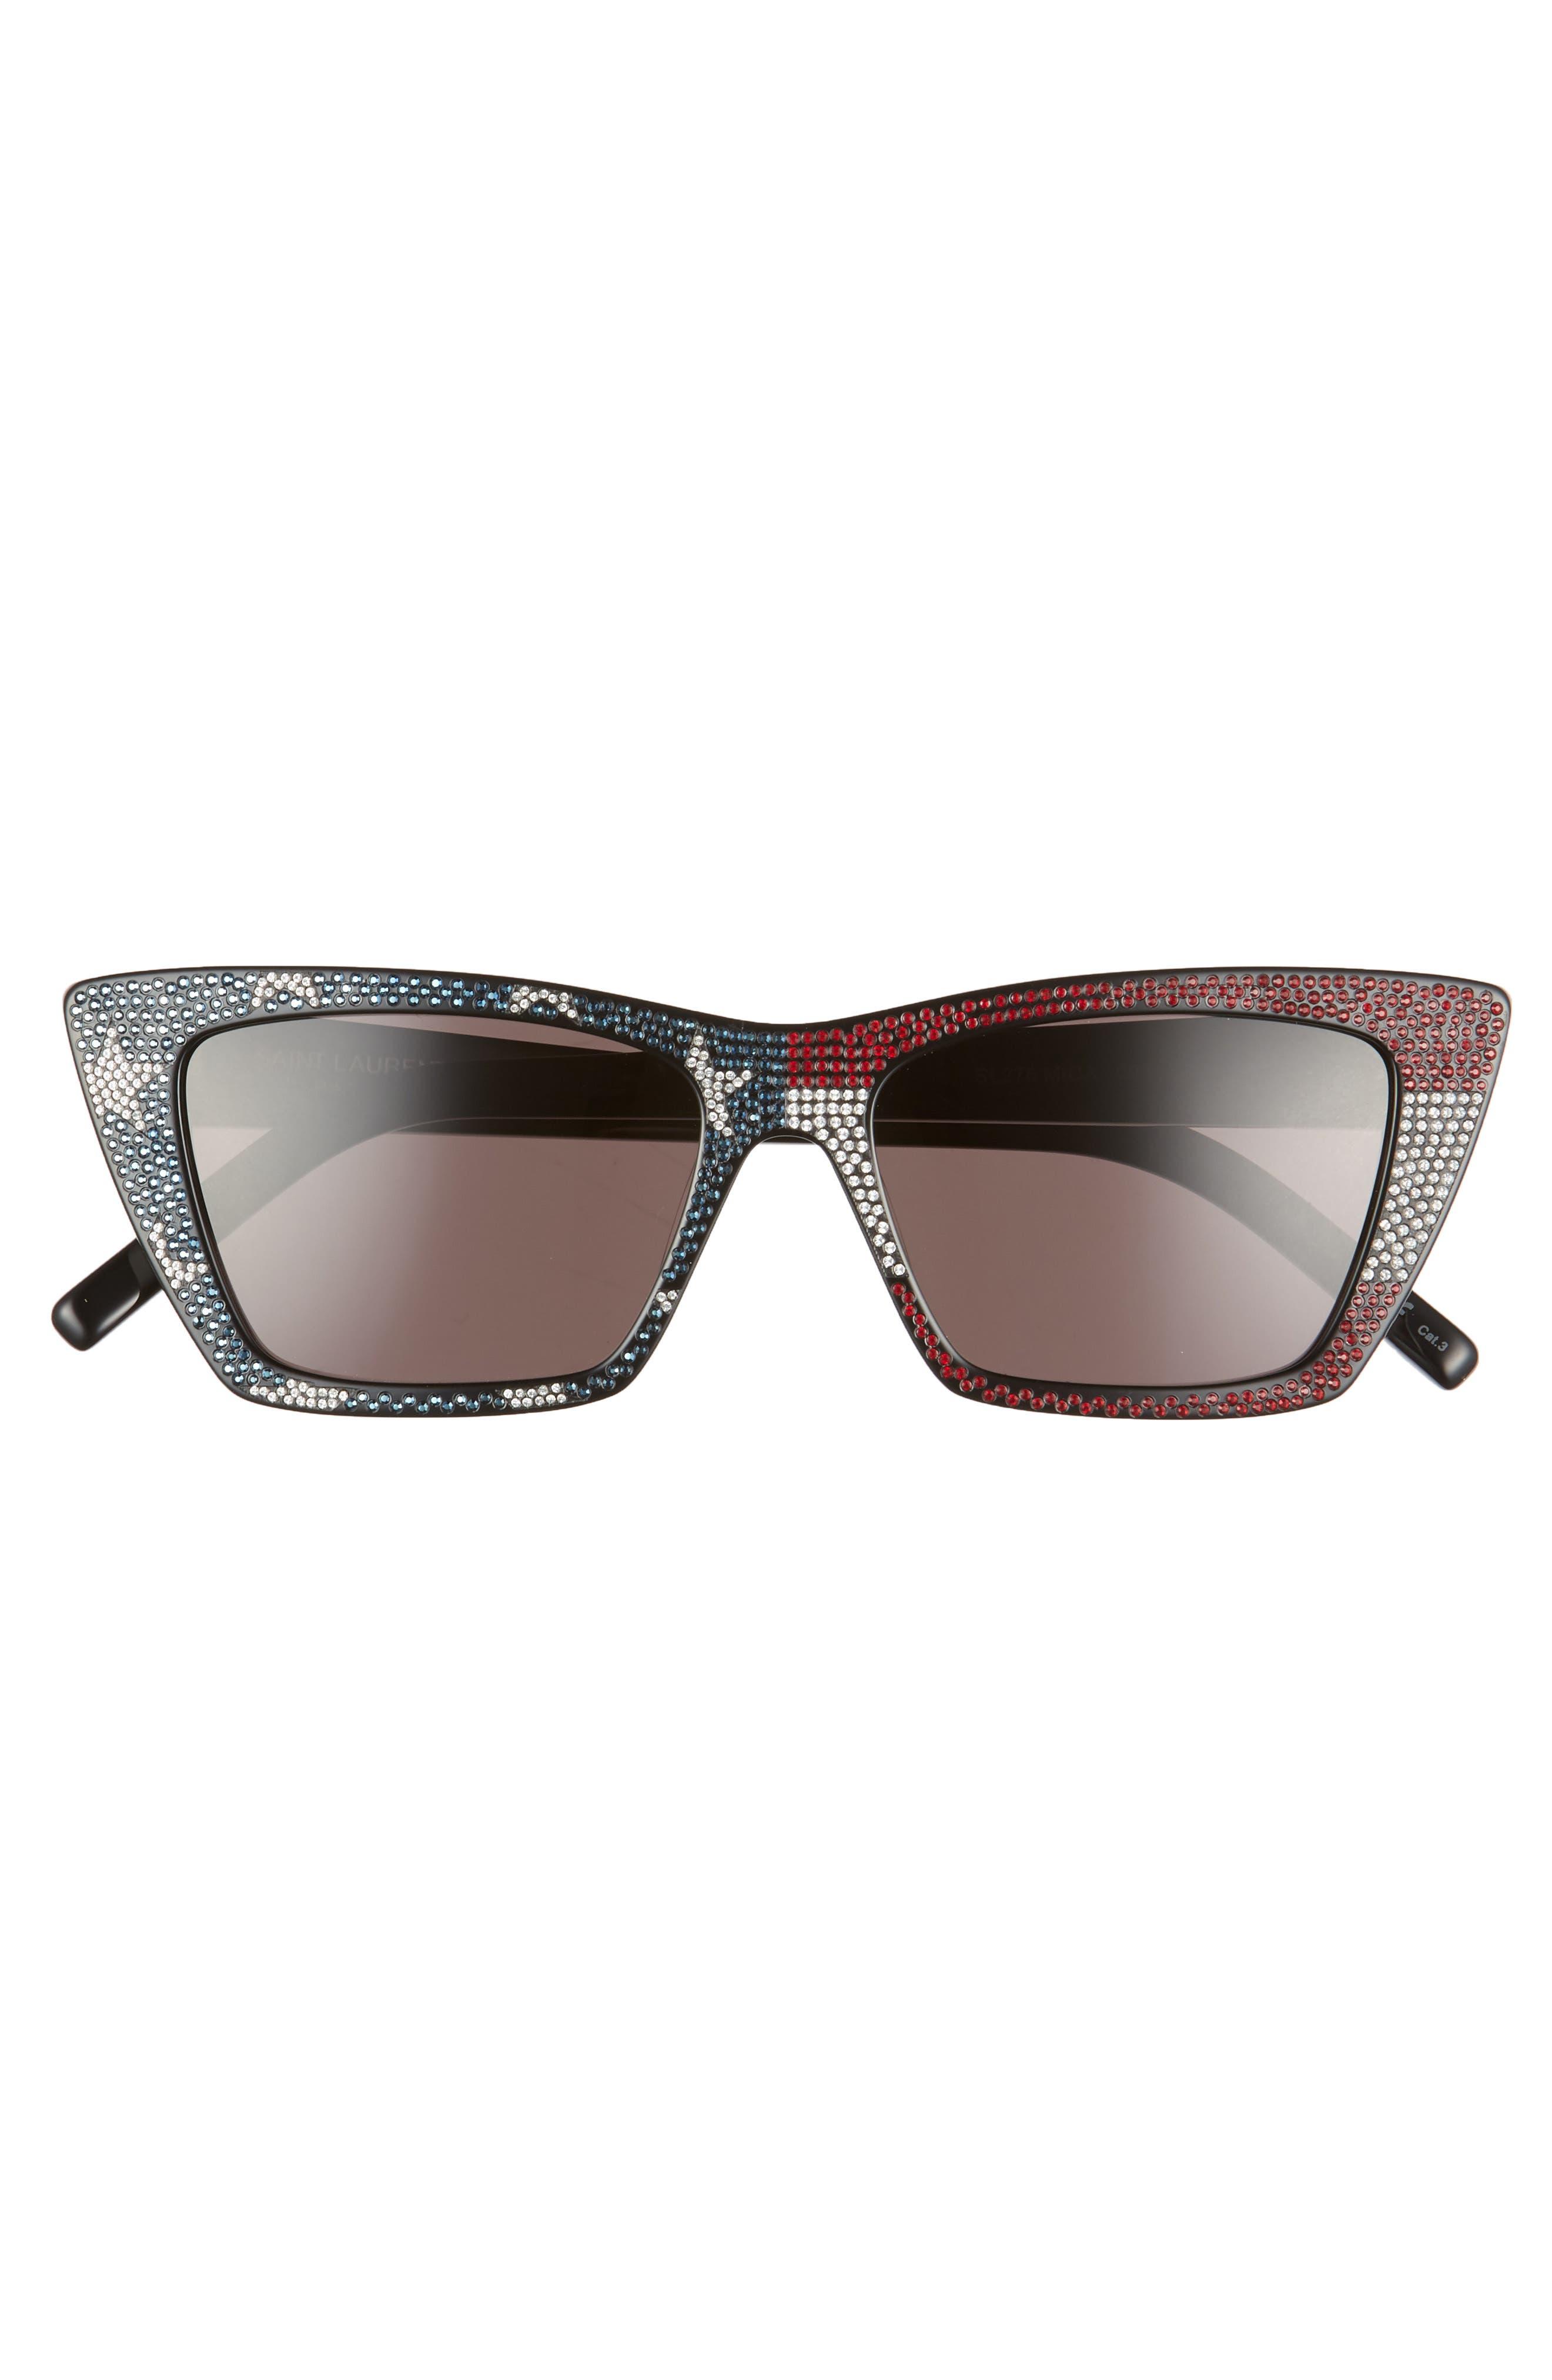 SAINT LAURENT, 53mm Cat Eye Sunglasses, Alternate thumbnail 3, color, BLACK/ CRYSTAL RED BLUE/ GREY